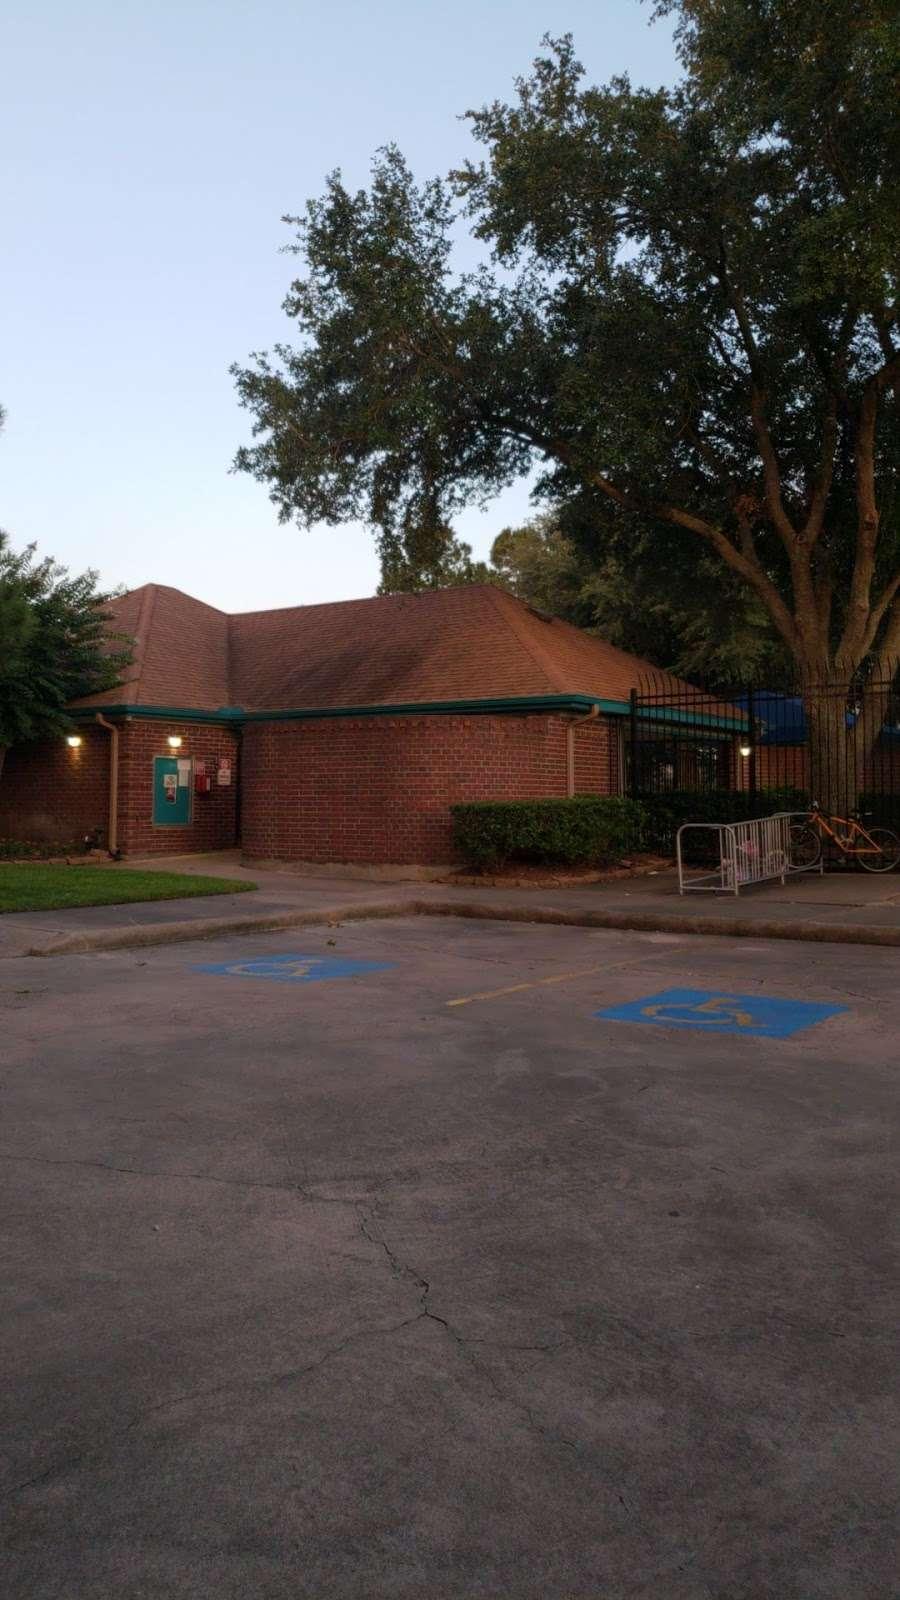 Westfield Pool/Splashpad/Tennis/Playground - park  | Photo 9 of 10 | Address: 19929, 20009 Misty Cove Dr, Katy, TX 77449, USA